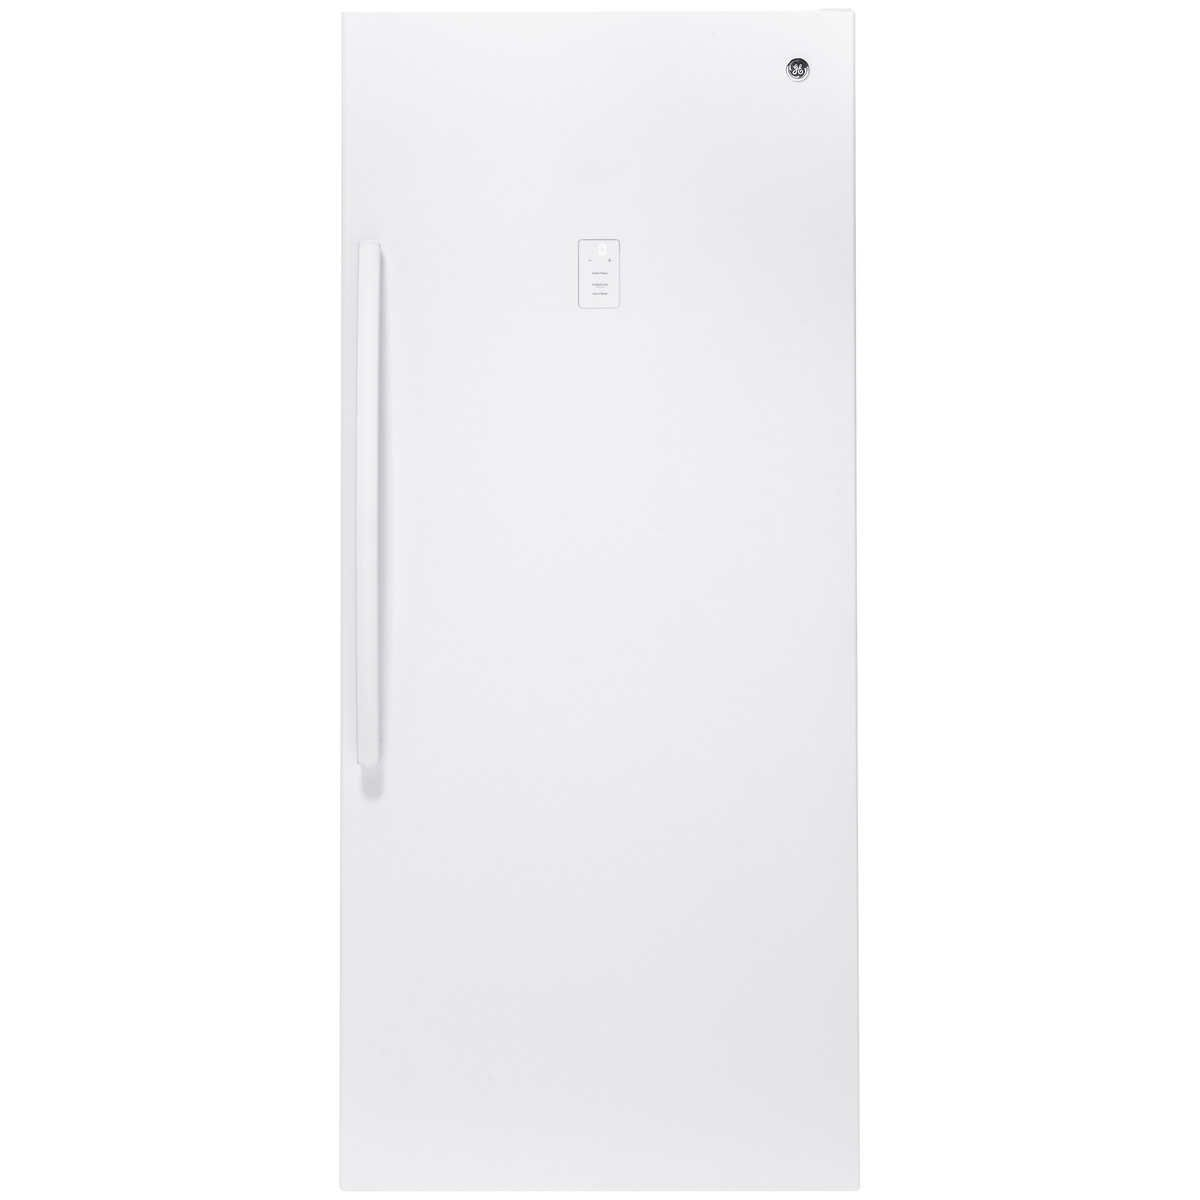 Ge 21 3 Cu Ft Frost Free Upright Freezer In 2020 Upright Freezer Interior Lighting Adjustable Shelving